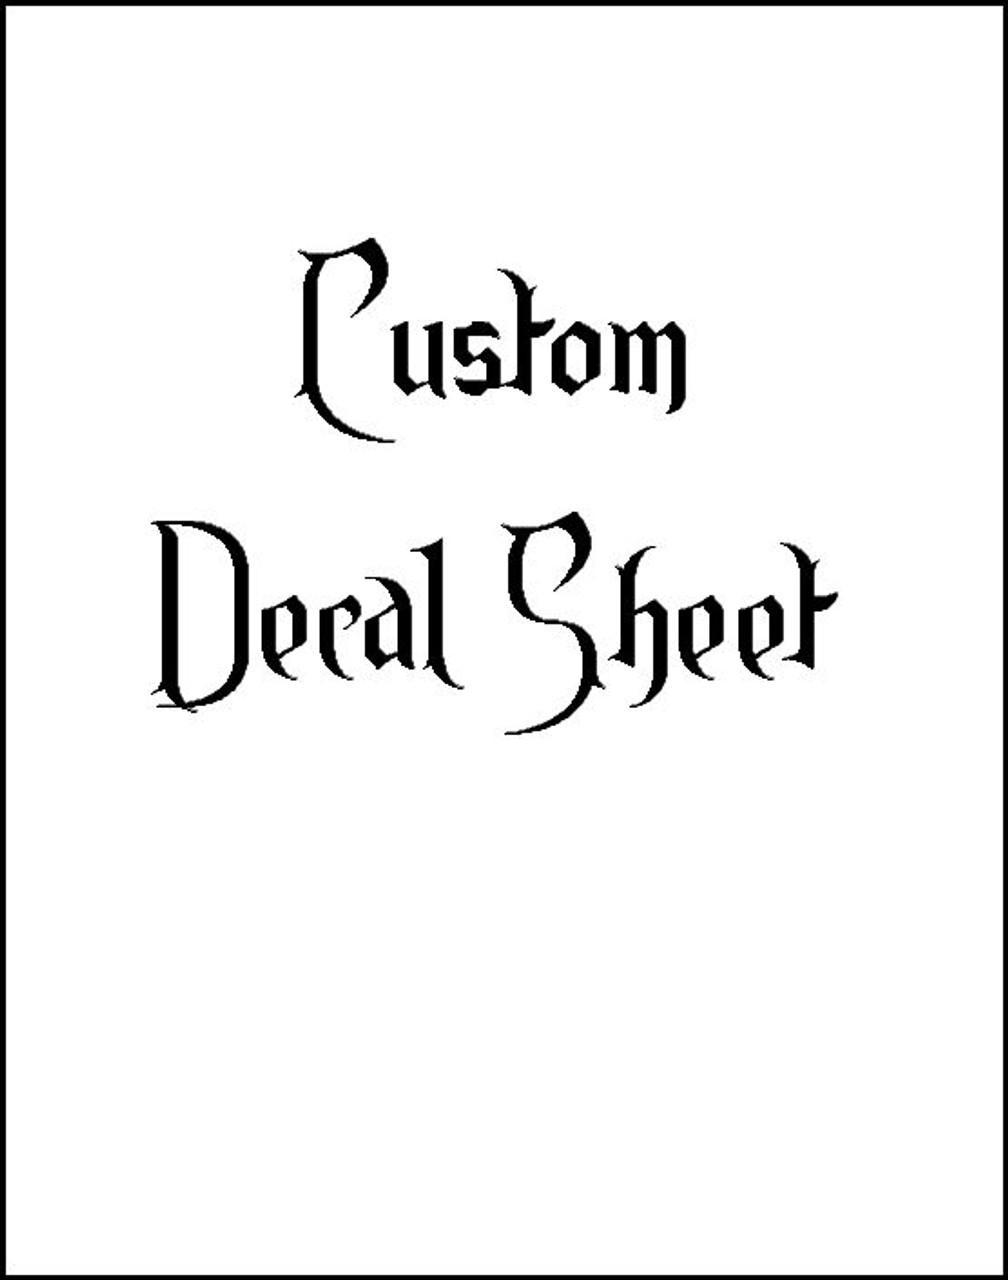 Custon Decal Sheet